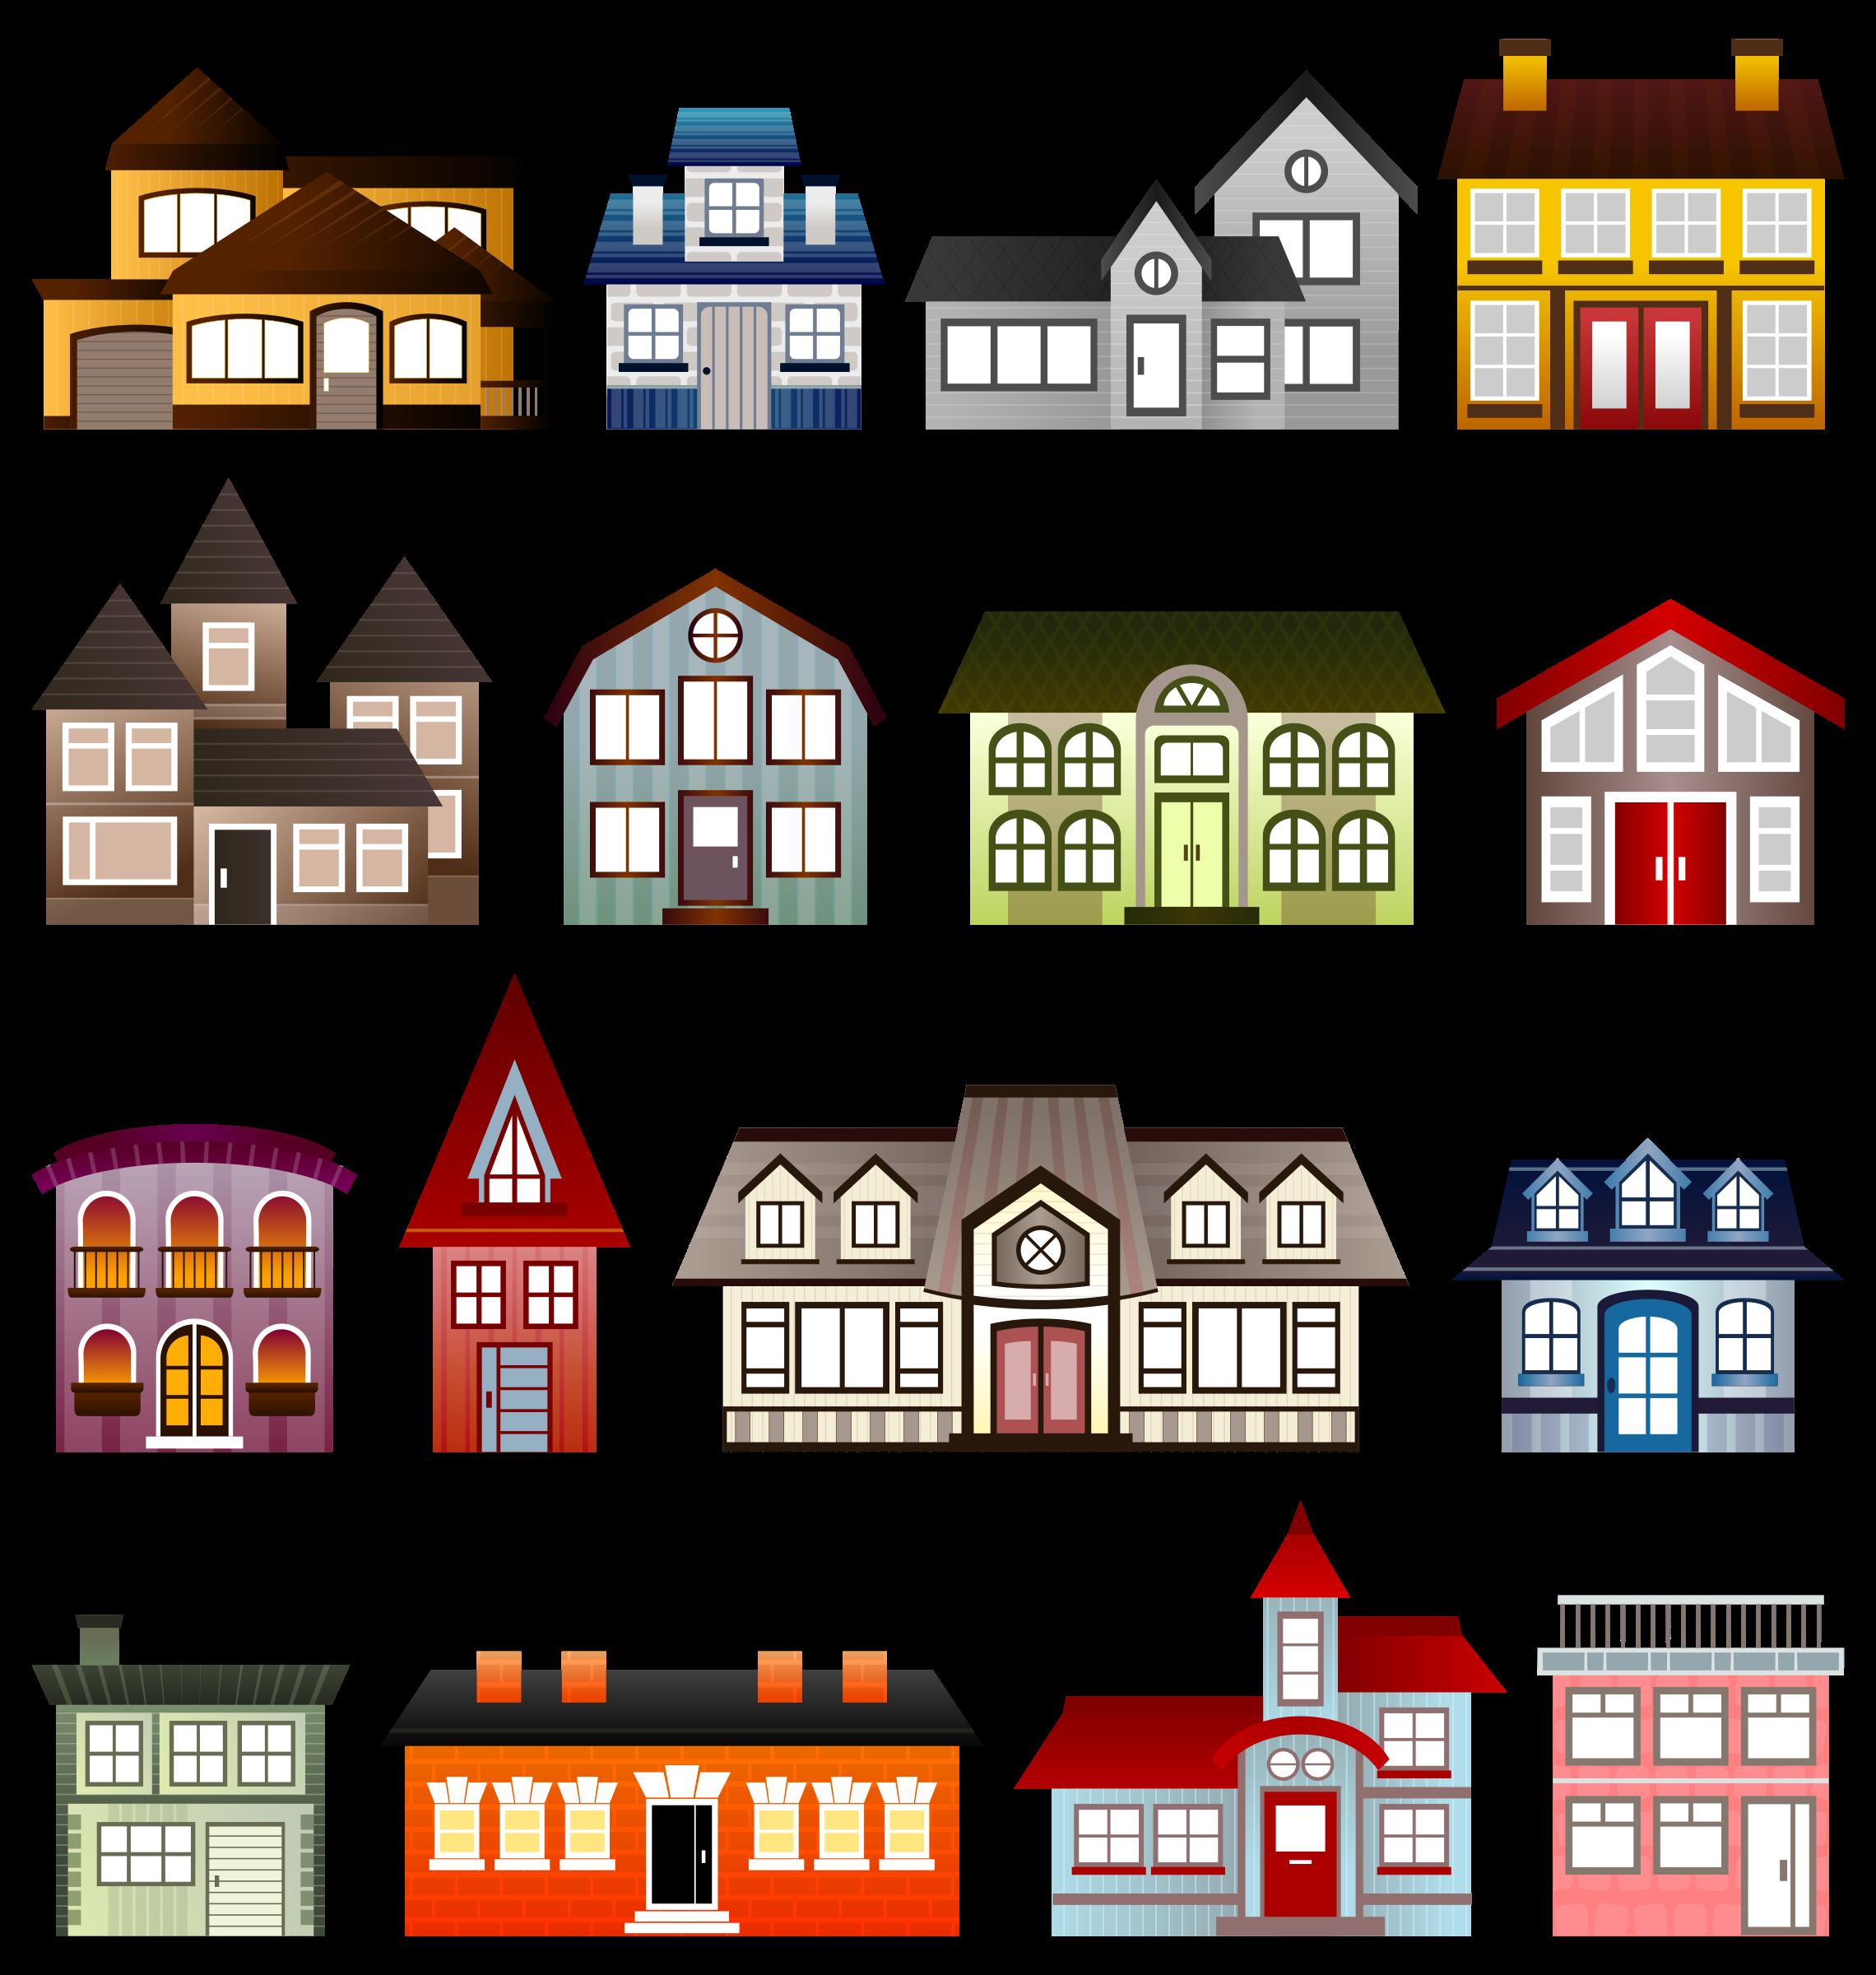 House clipart cartoon. Simple houses big image